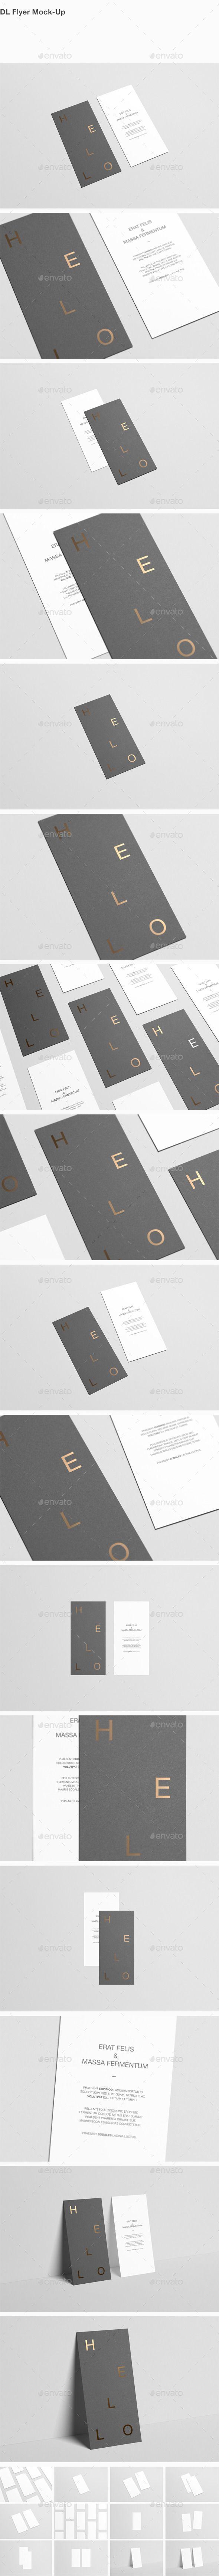 DL Flyer MockUp — Photoshop PSD #foil stamp #texture • Available here → https://graphicriver.net/item/dl-flyer-mockup/12831490?ref=pxcr